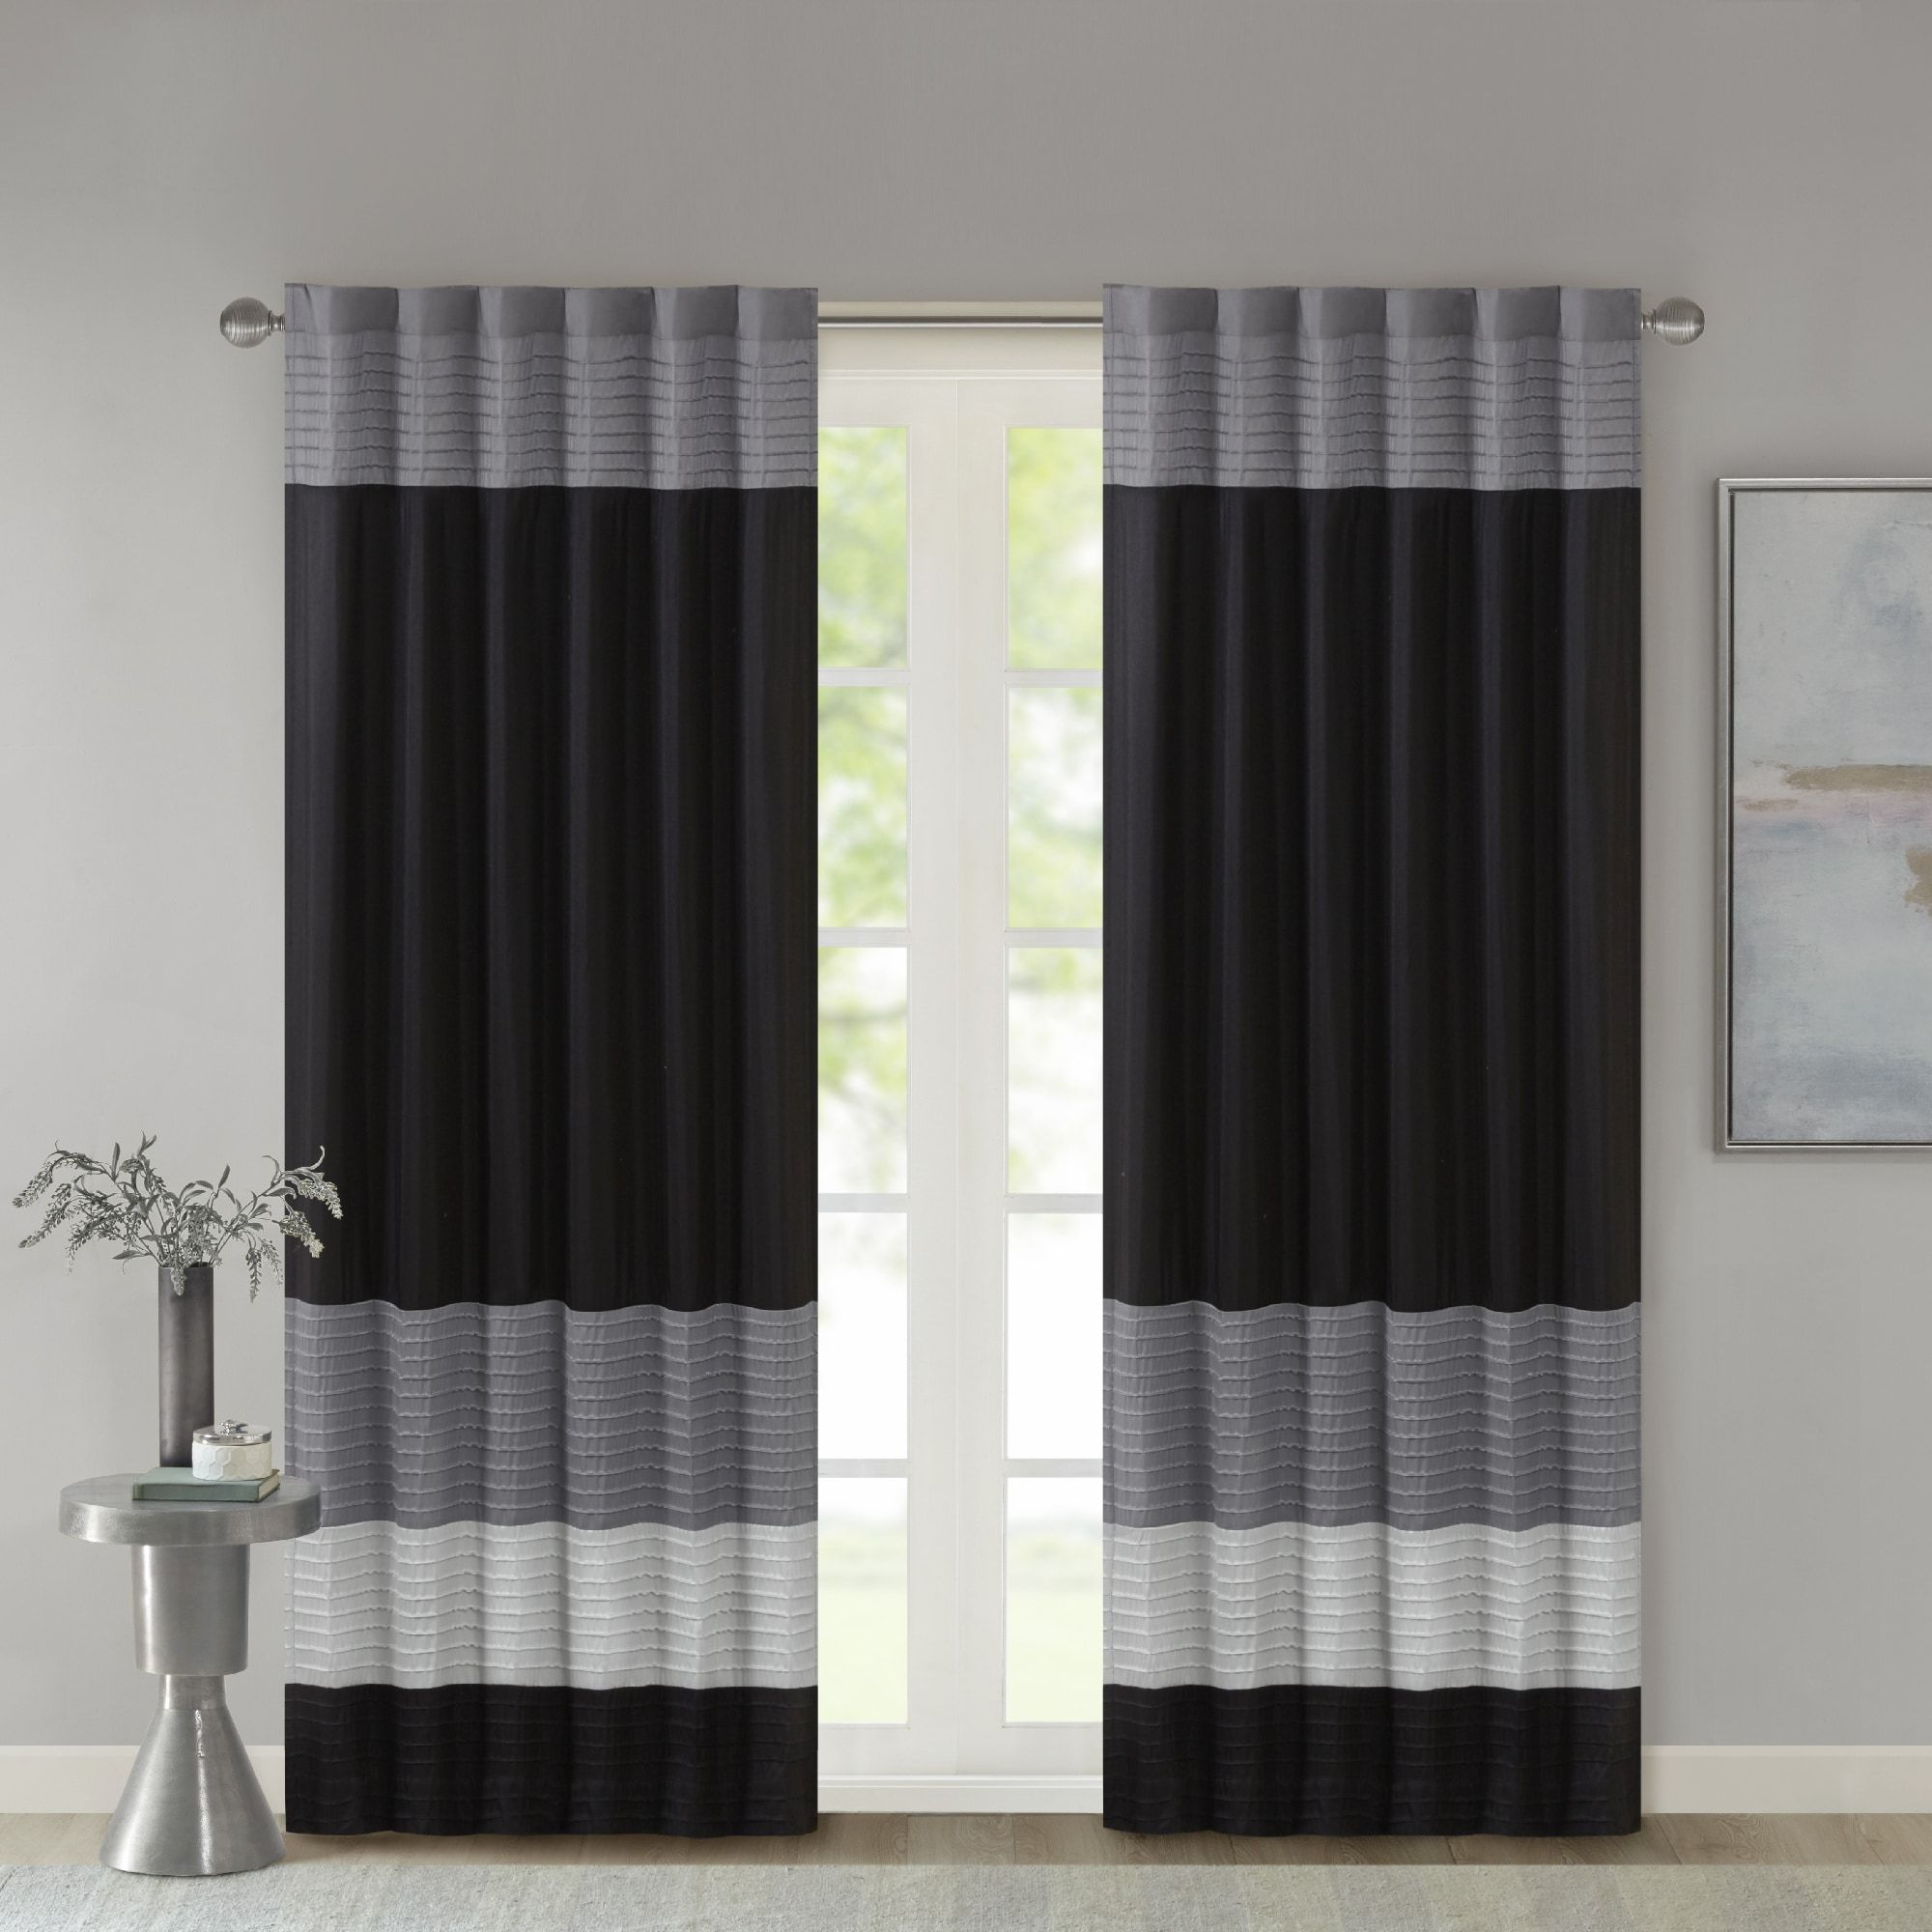 Madison Park Infinity Polyoni Pintuck Single Window Curtain Panel Panel Curtains Curtains Drapes Curtains